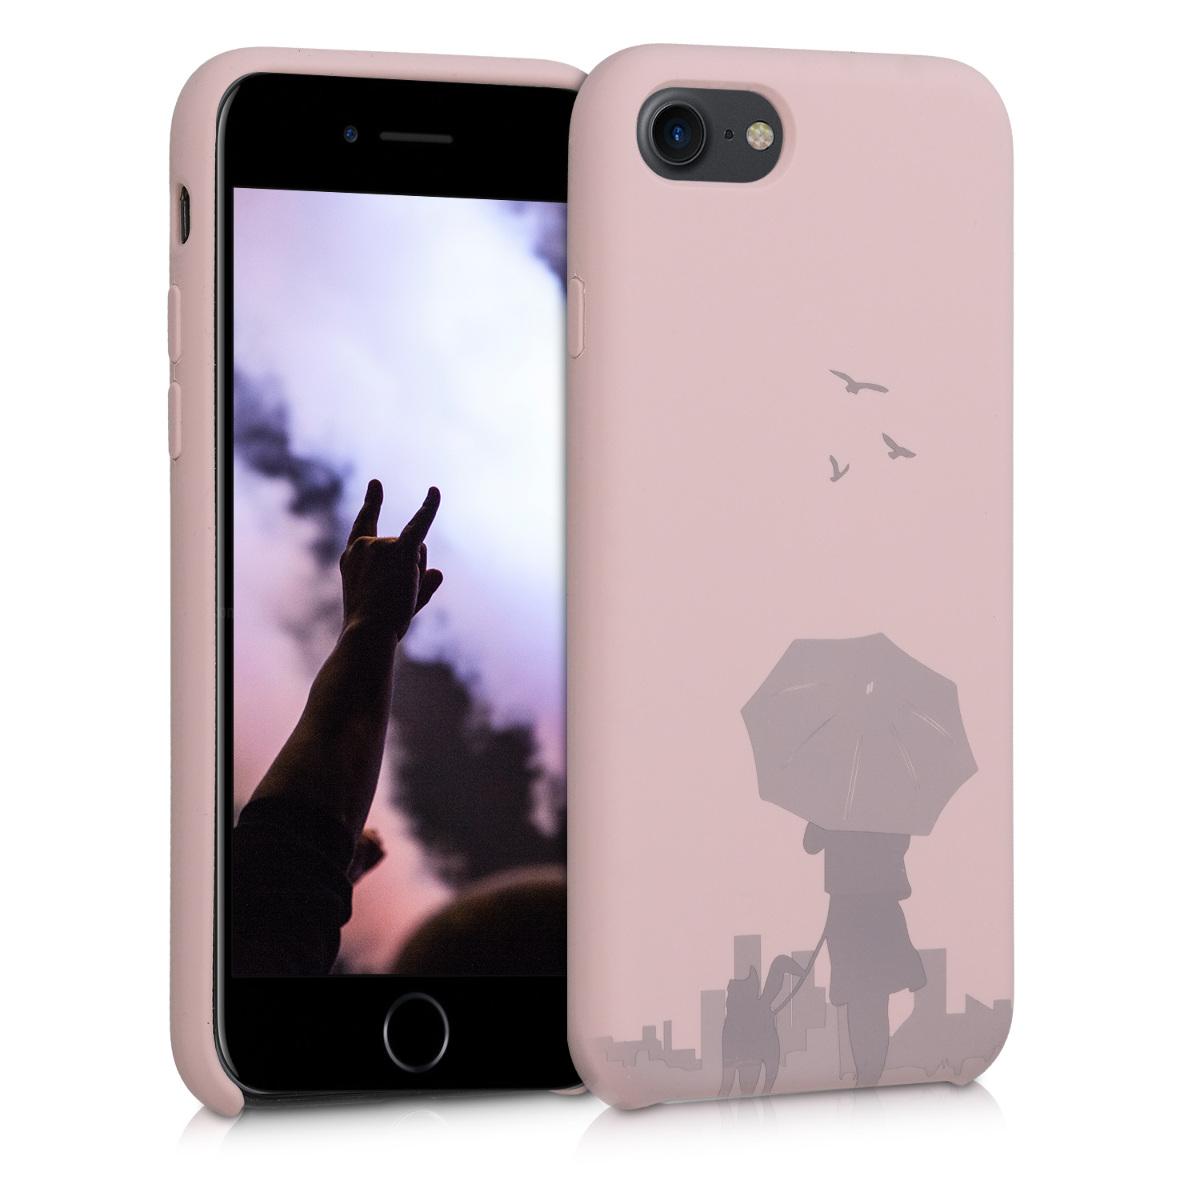 KW Θήκη Σιλικόνης Apple iPhone 7 / 8 - Laser Engraved Umbrella Dusty Pink (49557.05)